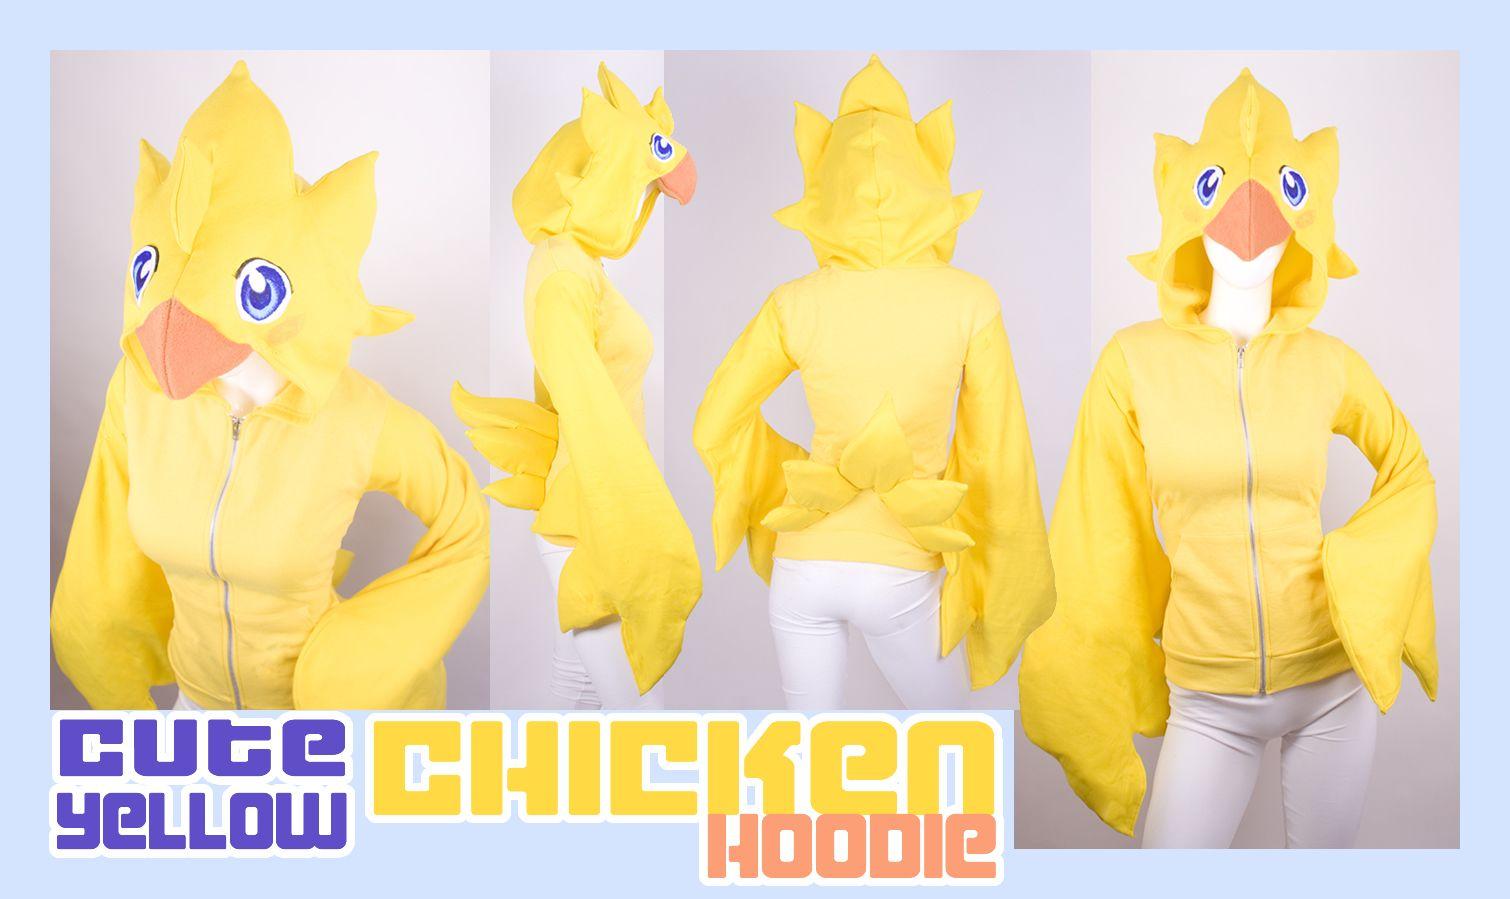 Cute Yellow Chicken Hoodie by *calgarycosplay on deviantART